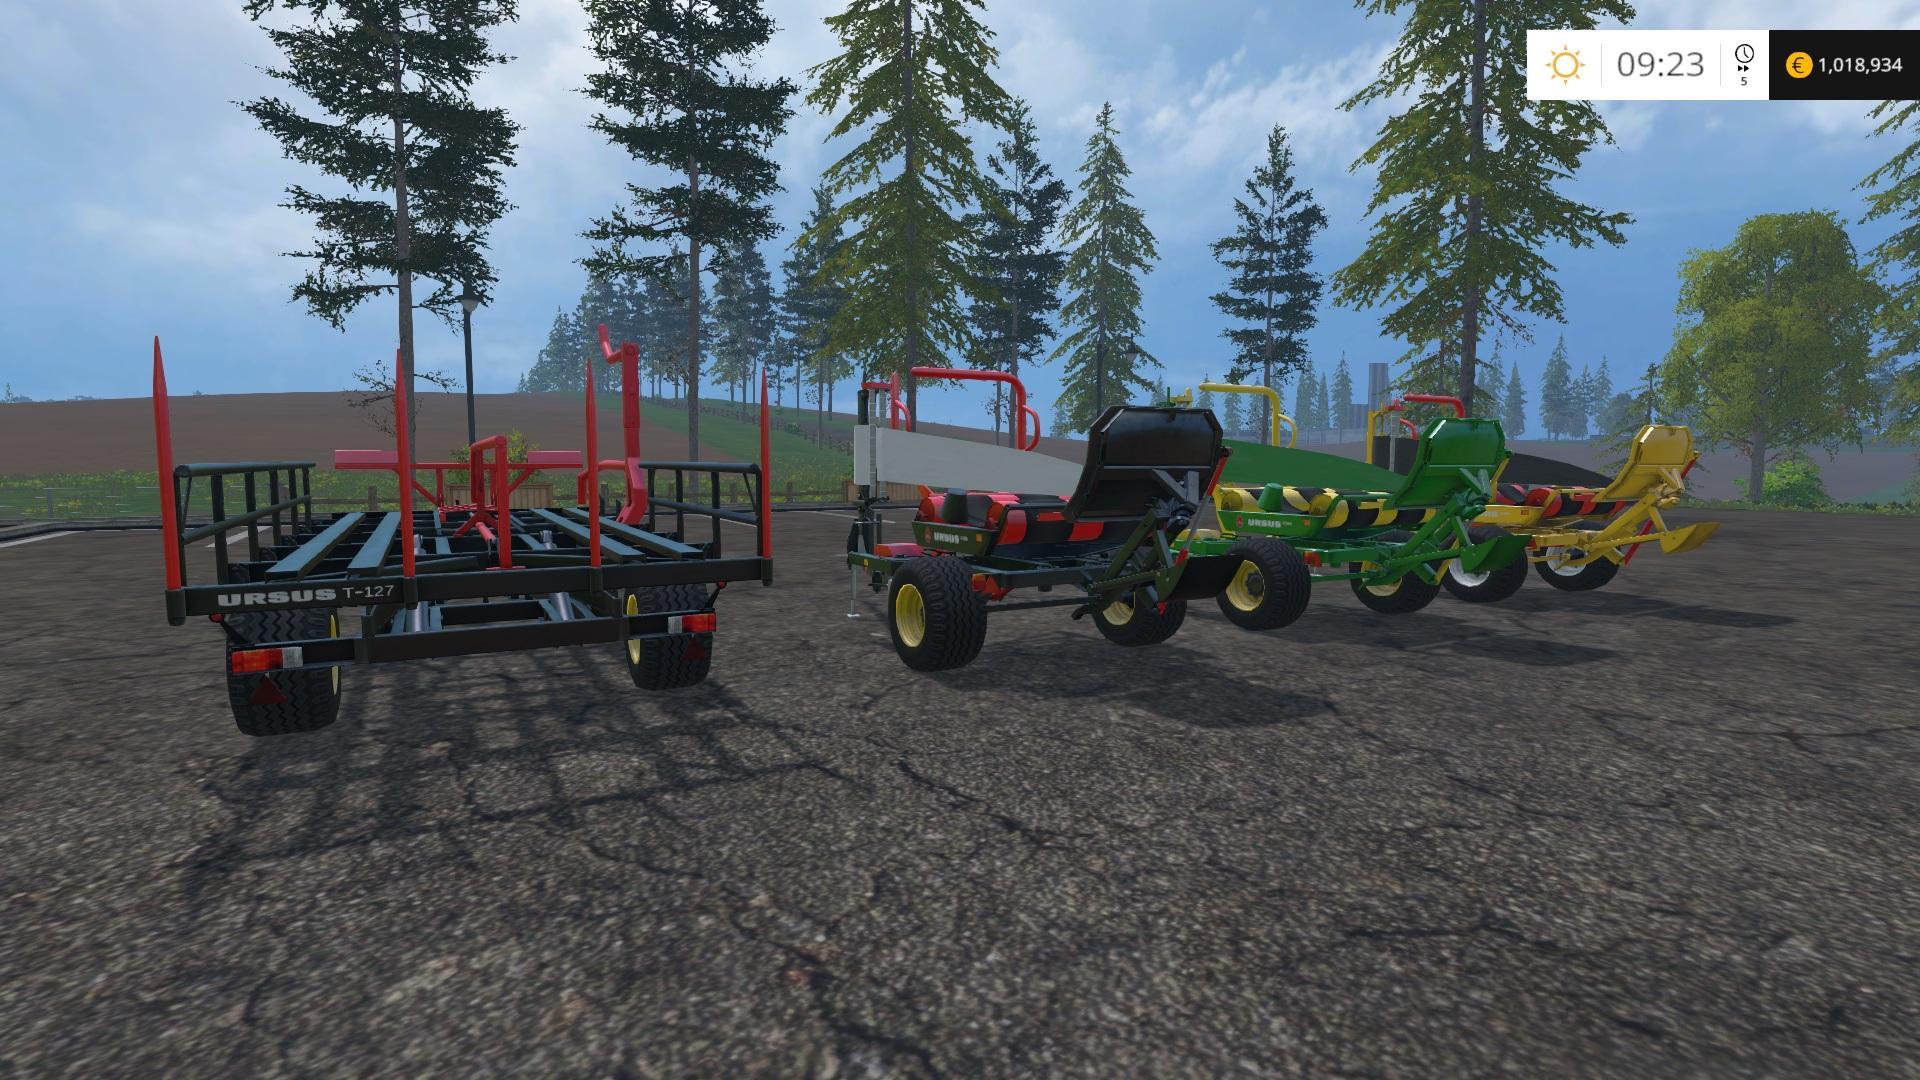 URSUS BALESTACKER AND WRAPPERS V1 MOD - Farming simulator